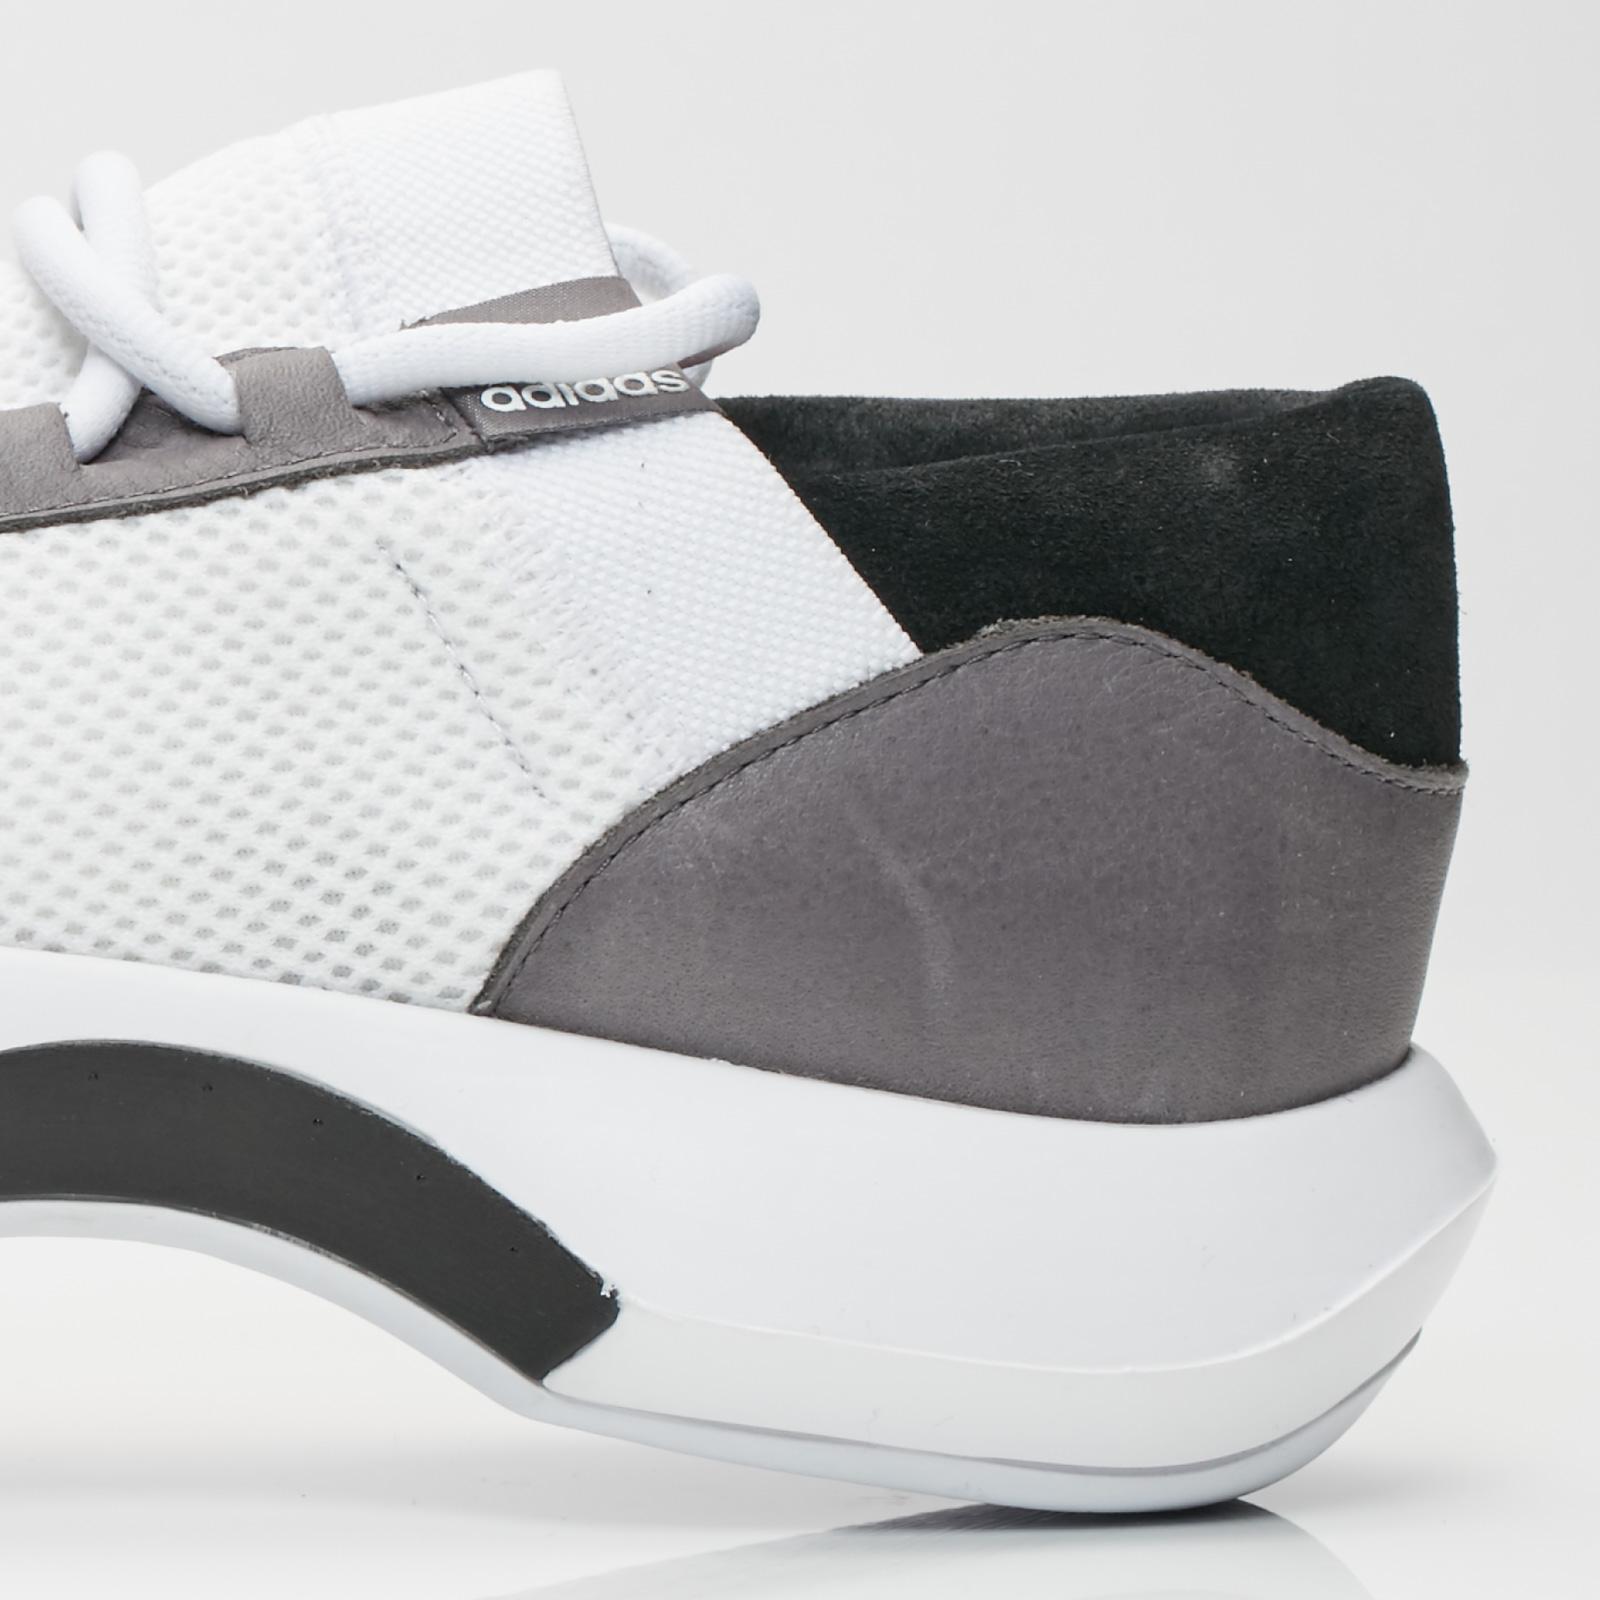 separation shoes 0a45d e87f8 finest selection 62d18 05aaf sneaker adidas consortium workshop ad ...